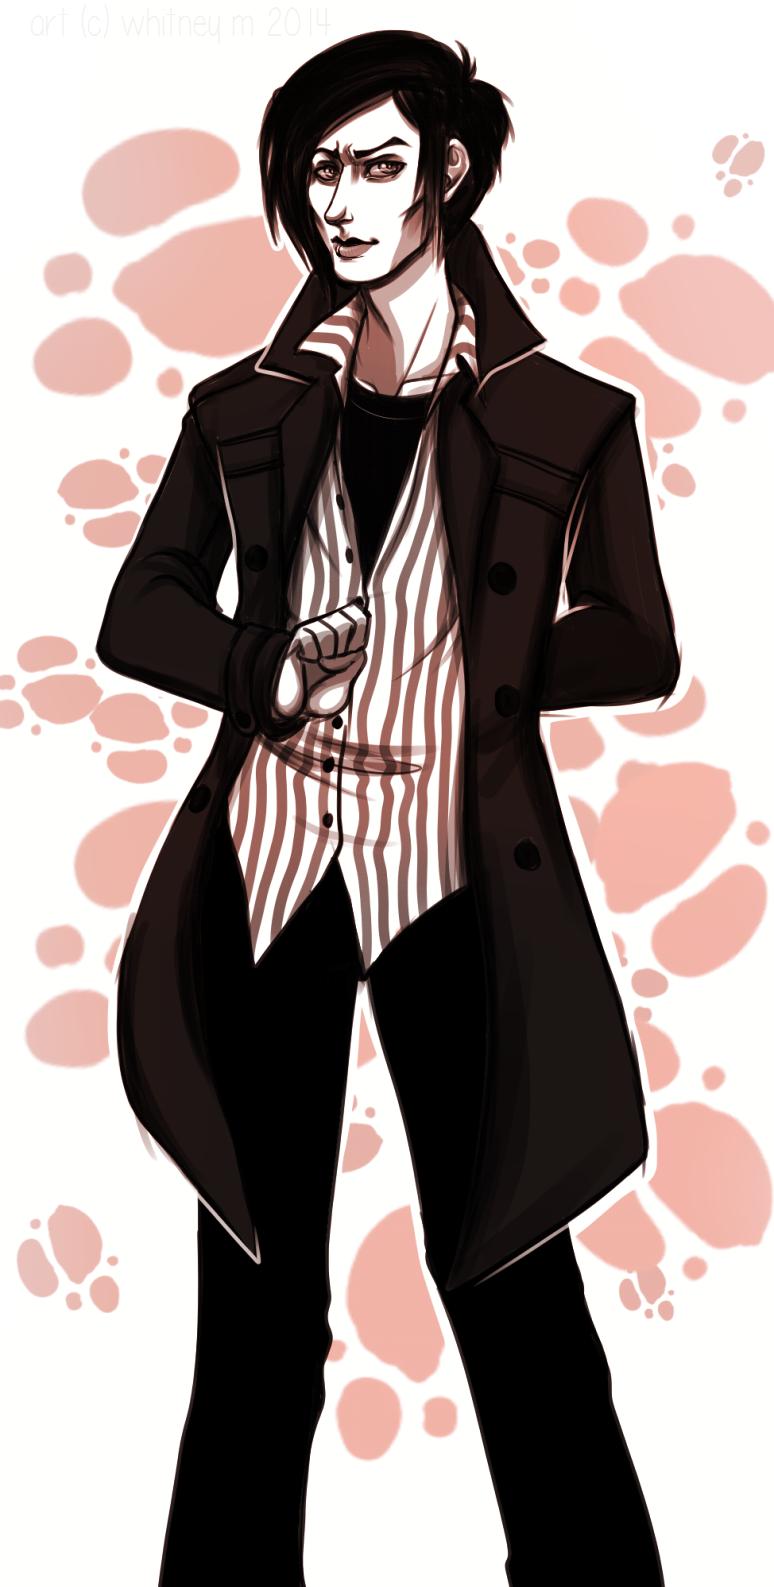 A Vampire Guy